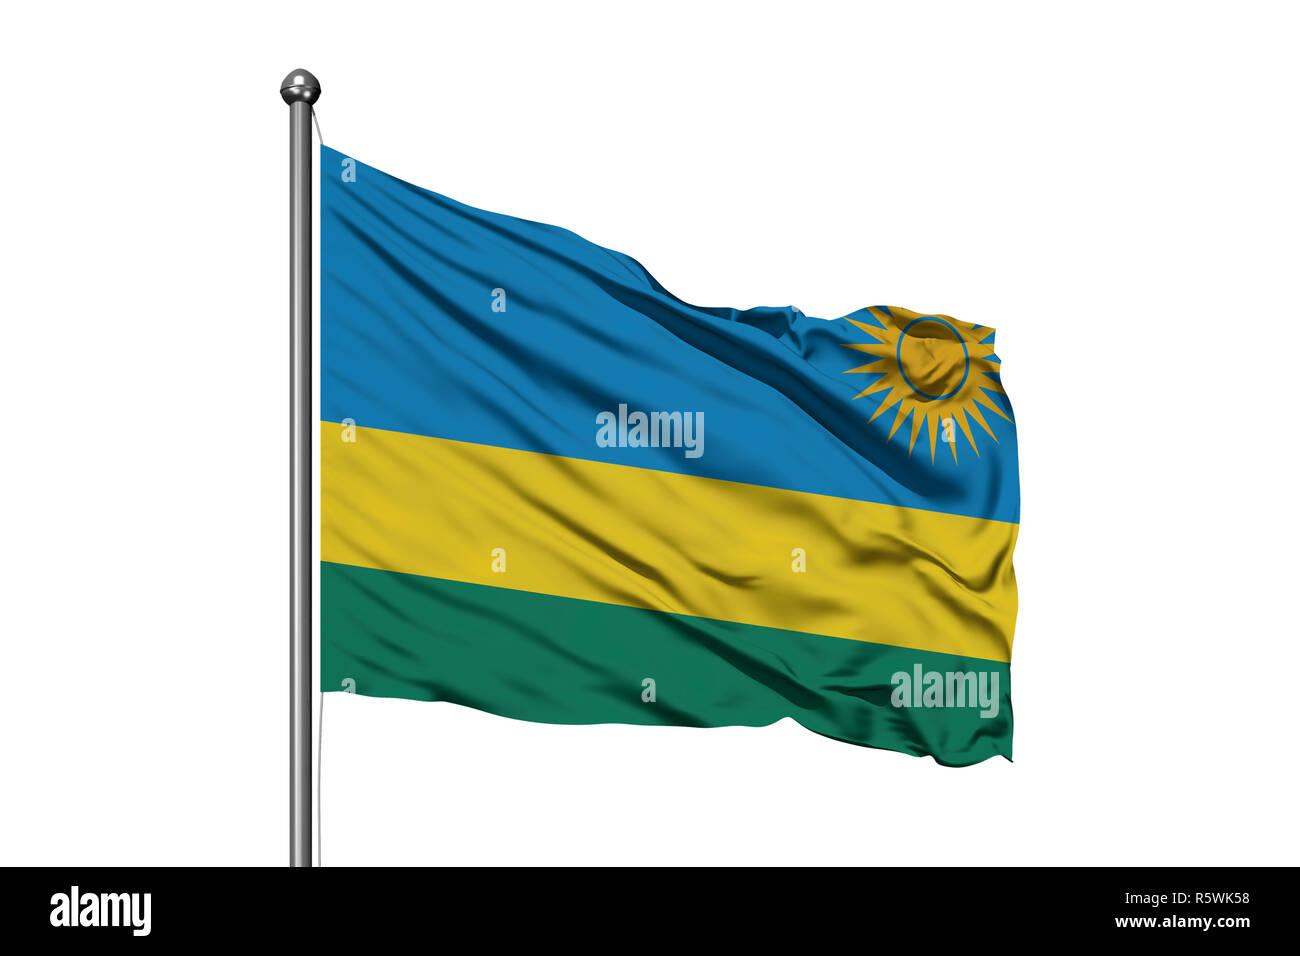 Flag of Rwanda waving in the wind, isolated white background. Rwandan flag. - Stock Image